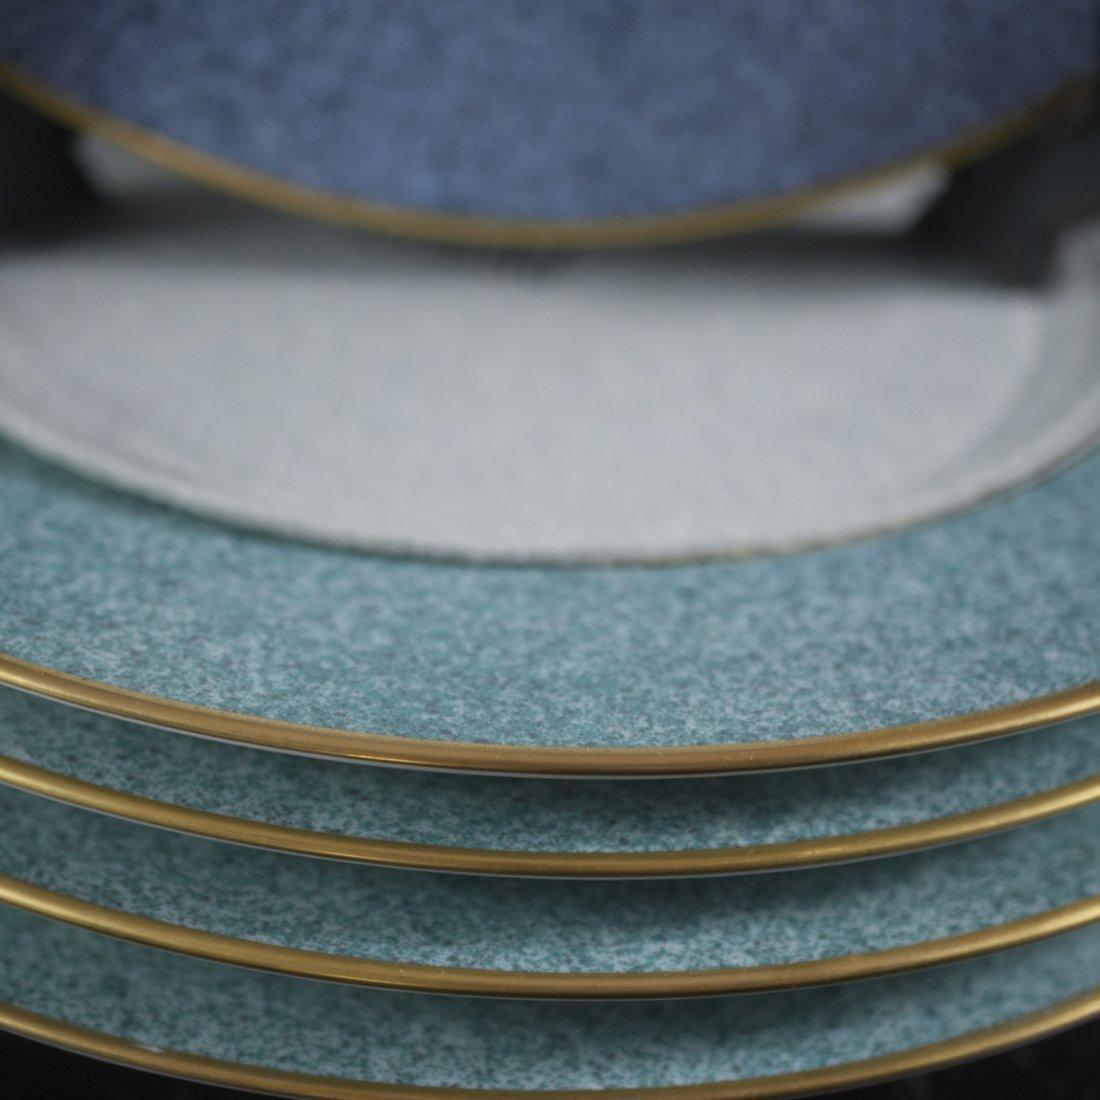 Bernardaud Limoges Porcelain Dinner Plates - 4